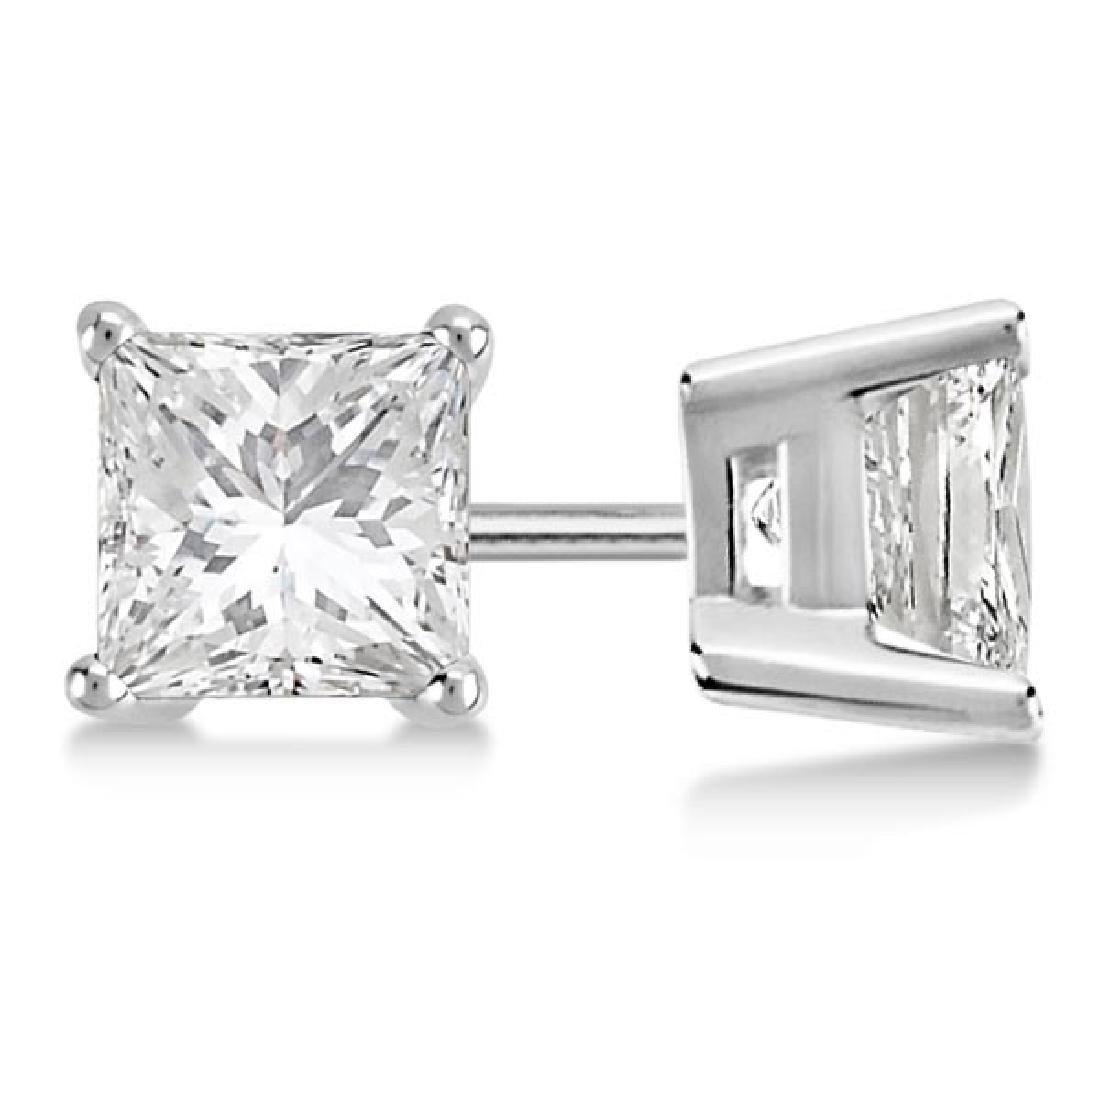 Certified 1.05 CTW Princess Diamond Stud Earrings E/SI2